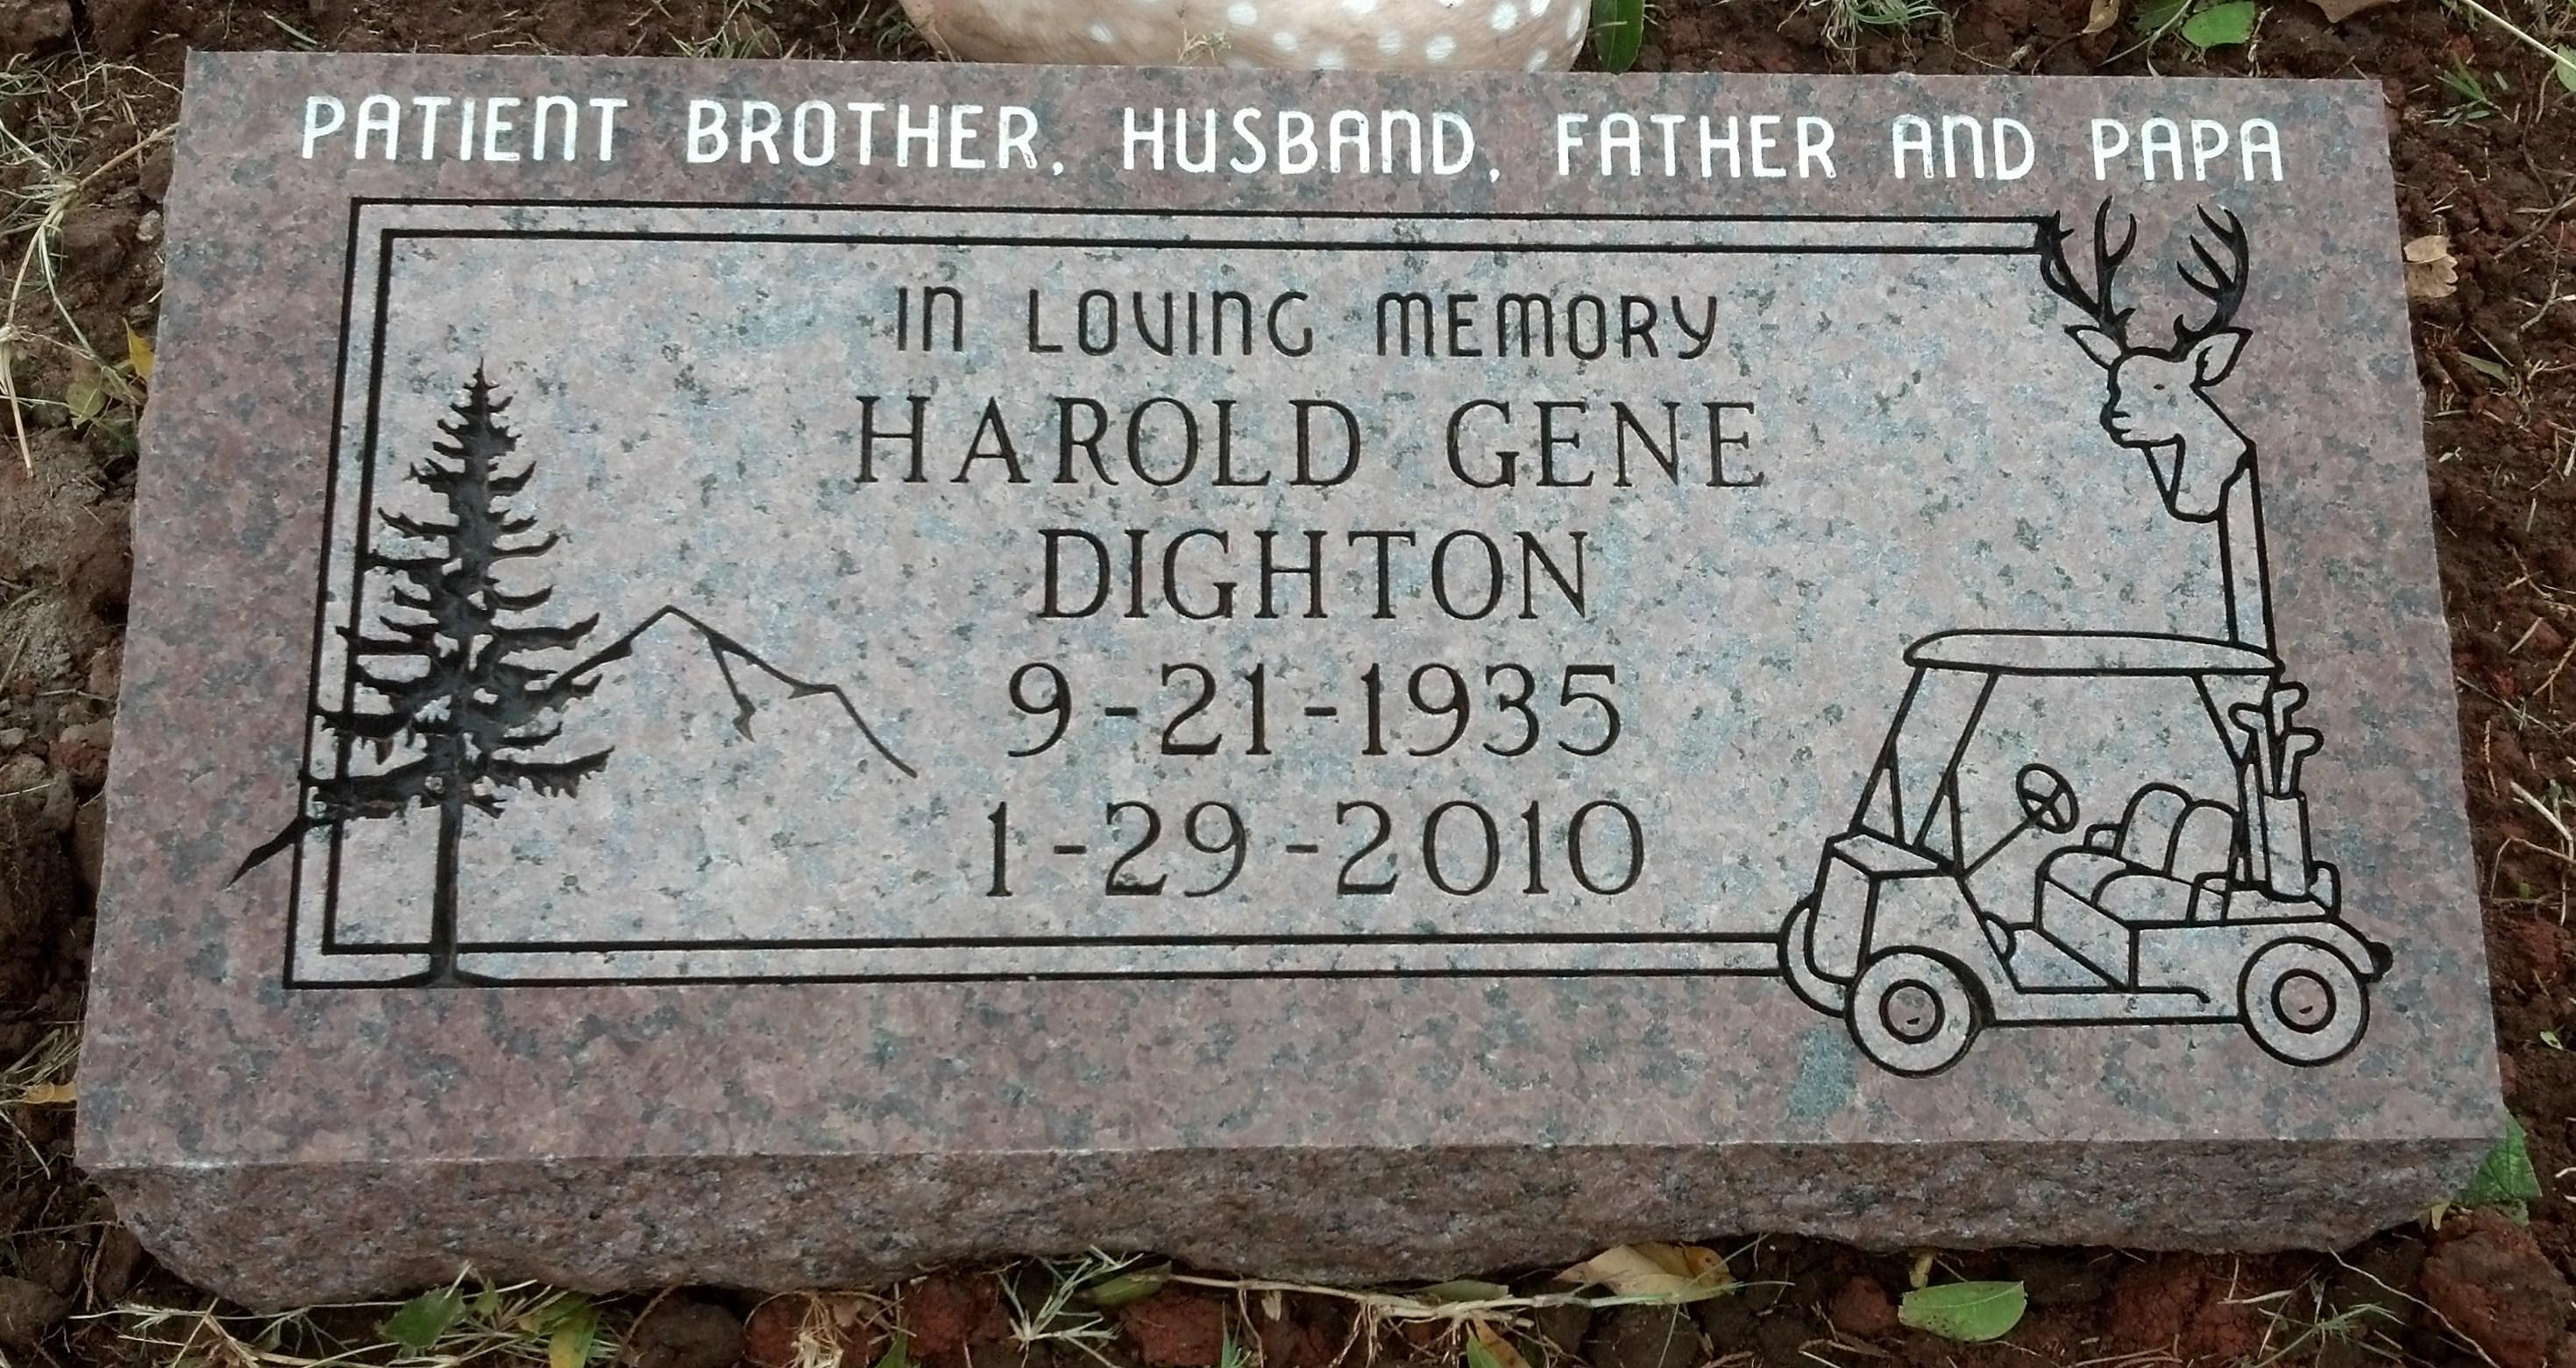 Dighton, Harold